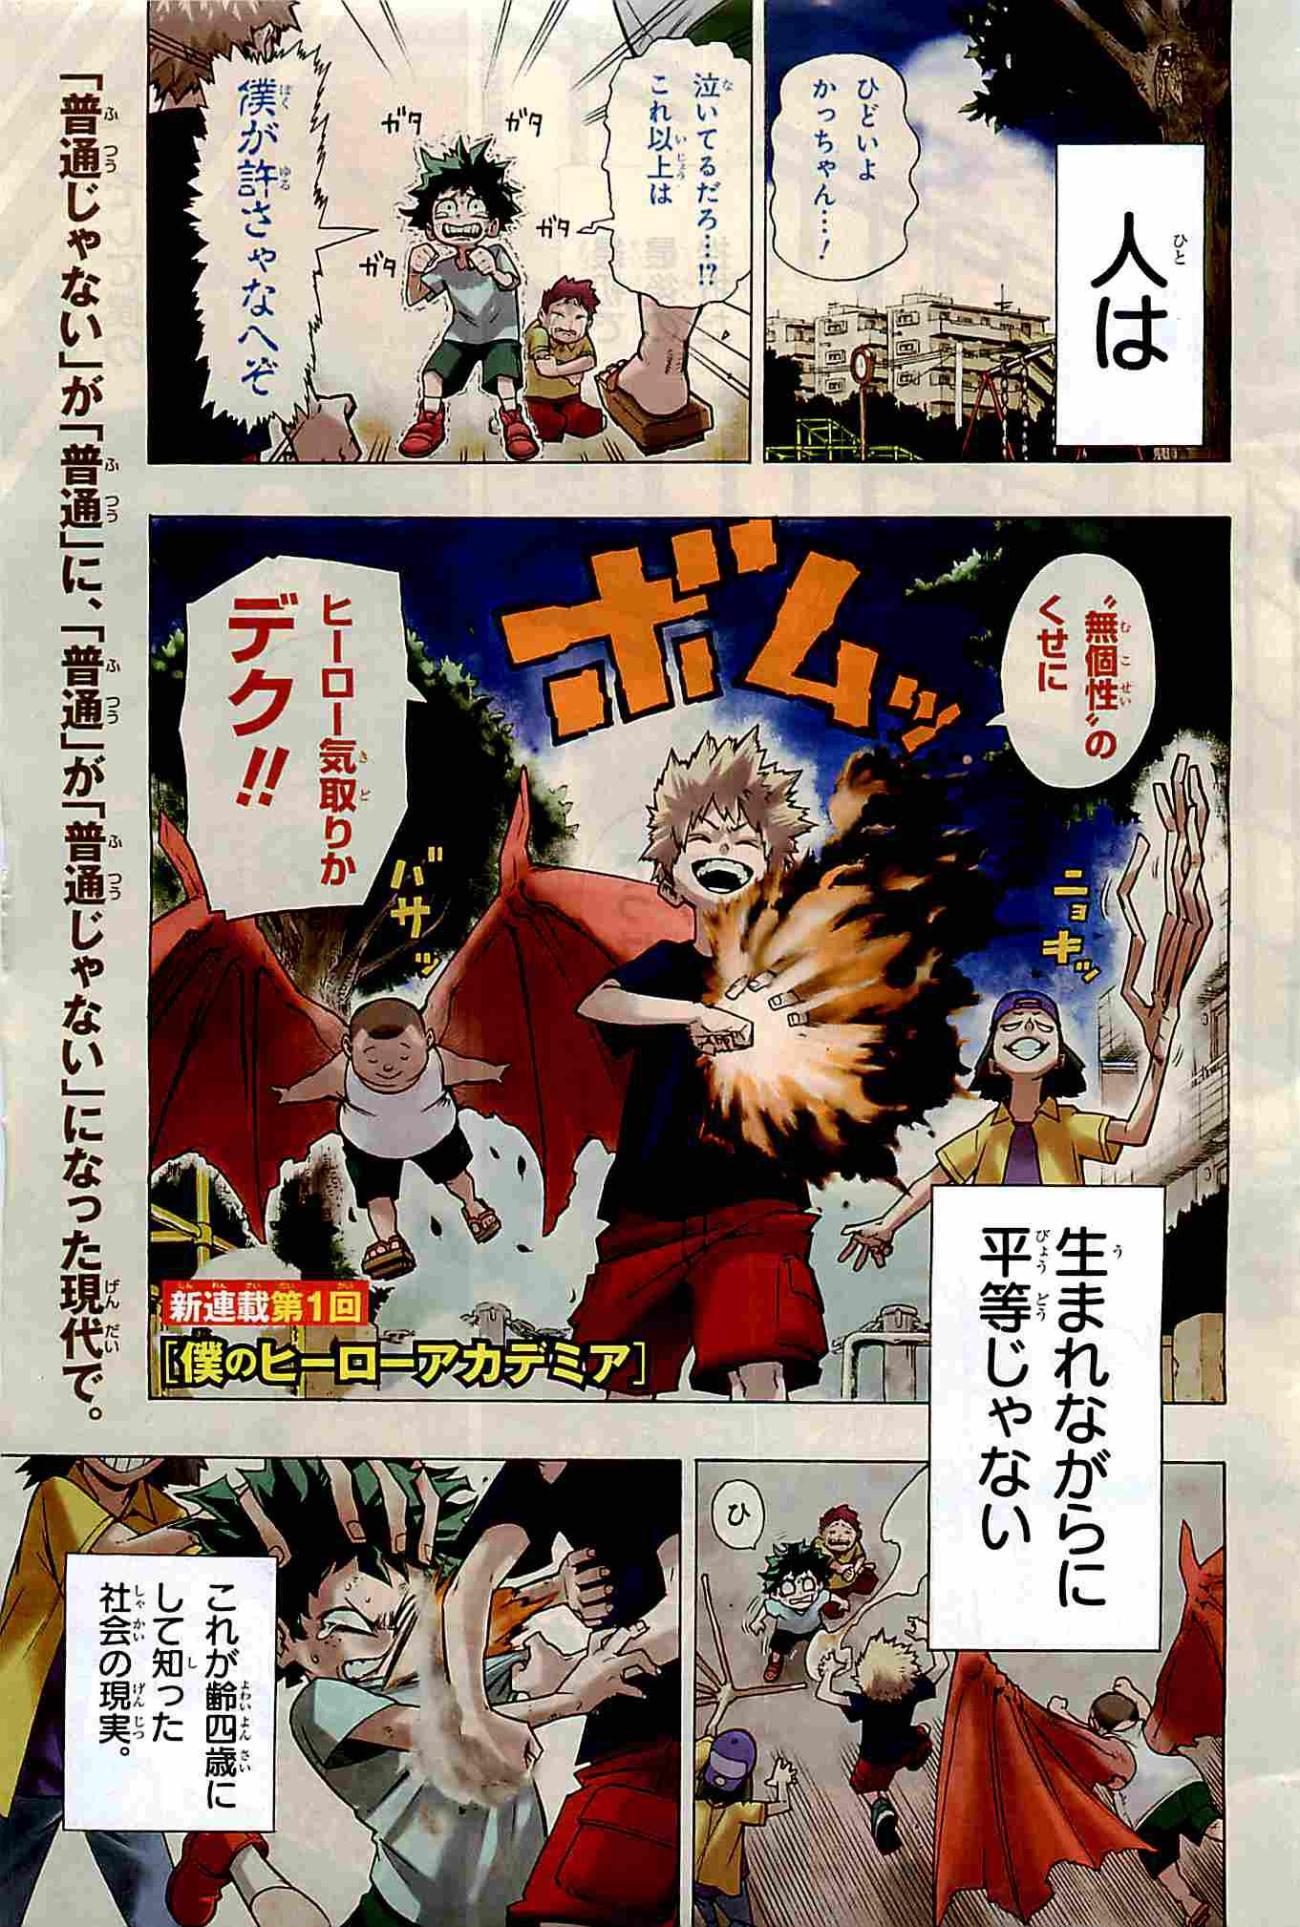 Hero Academia Weekly Shonen Jump 2014 #32